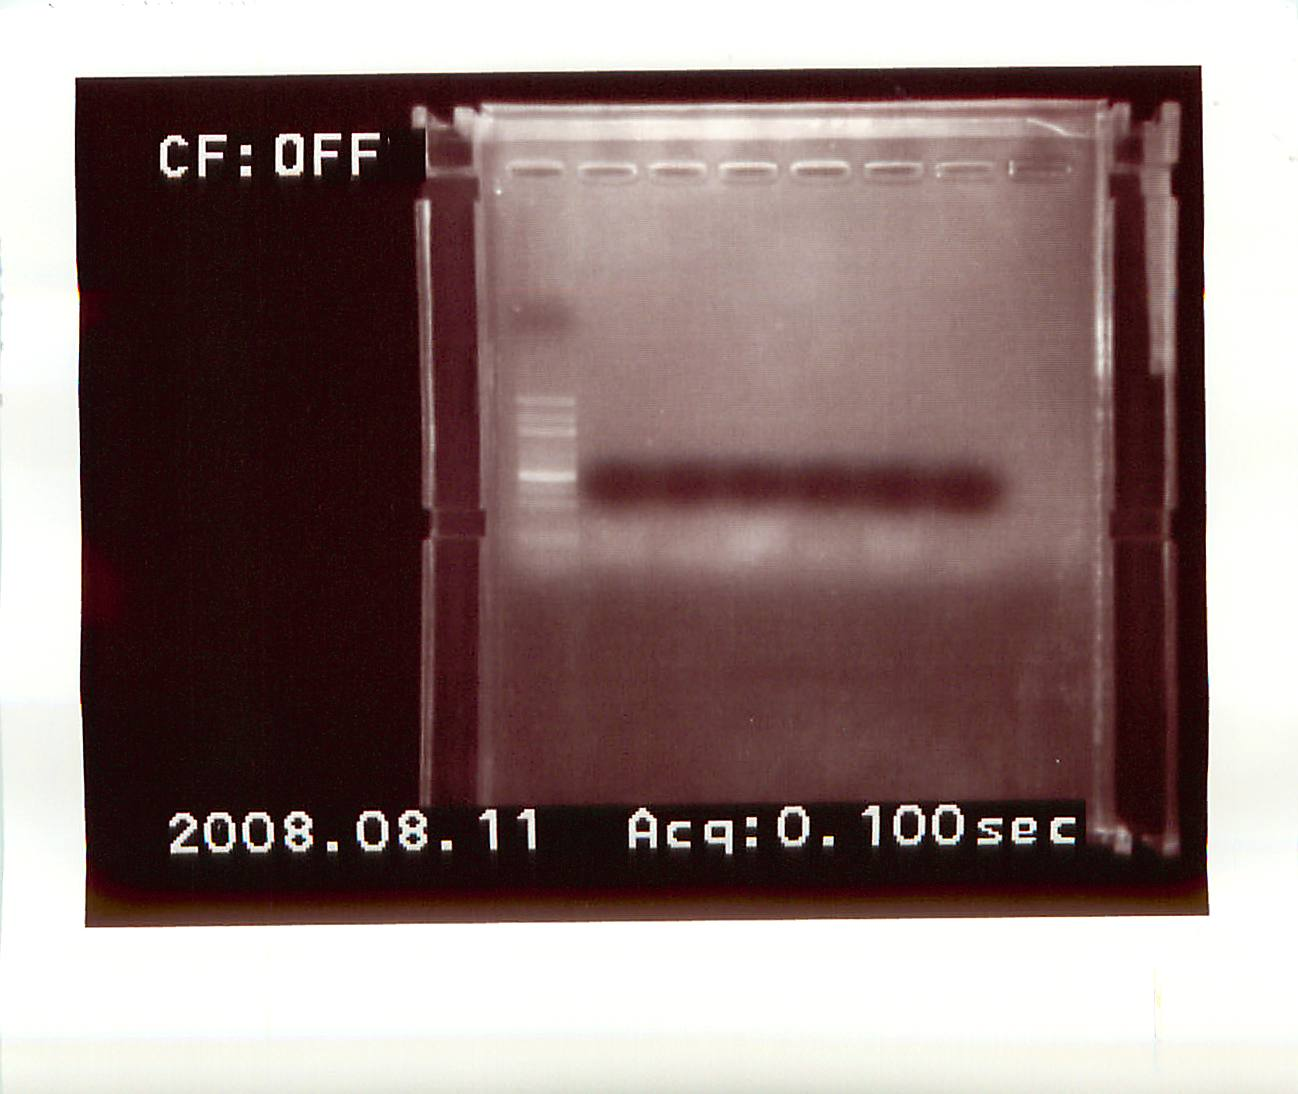 external image 20080811-01.jpg